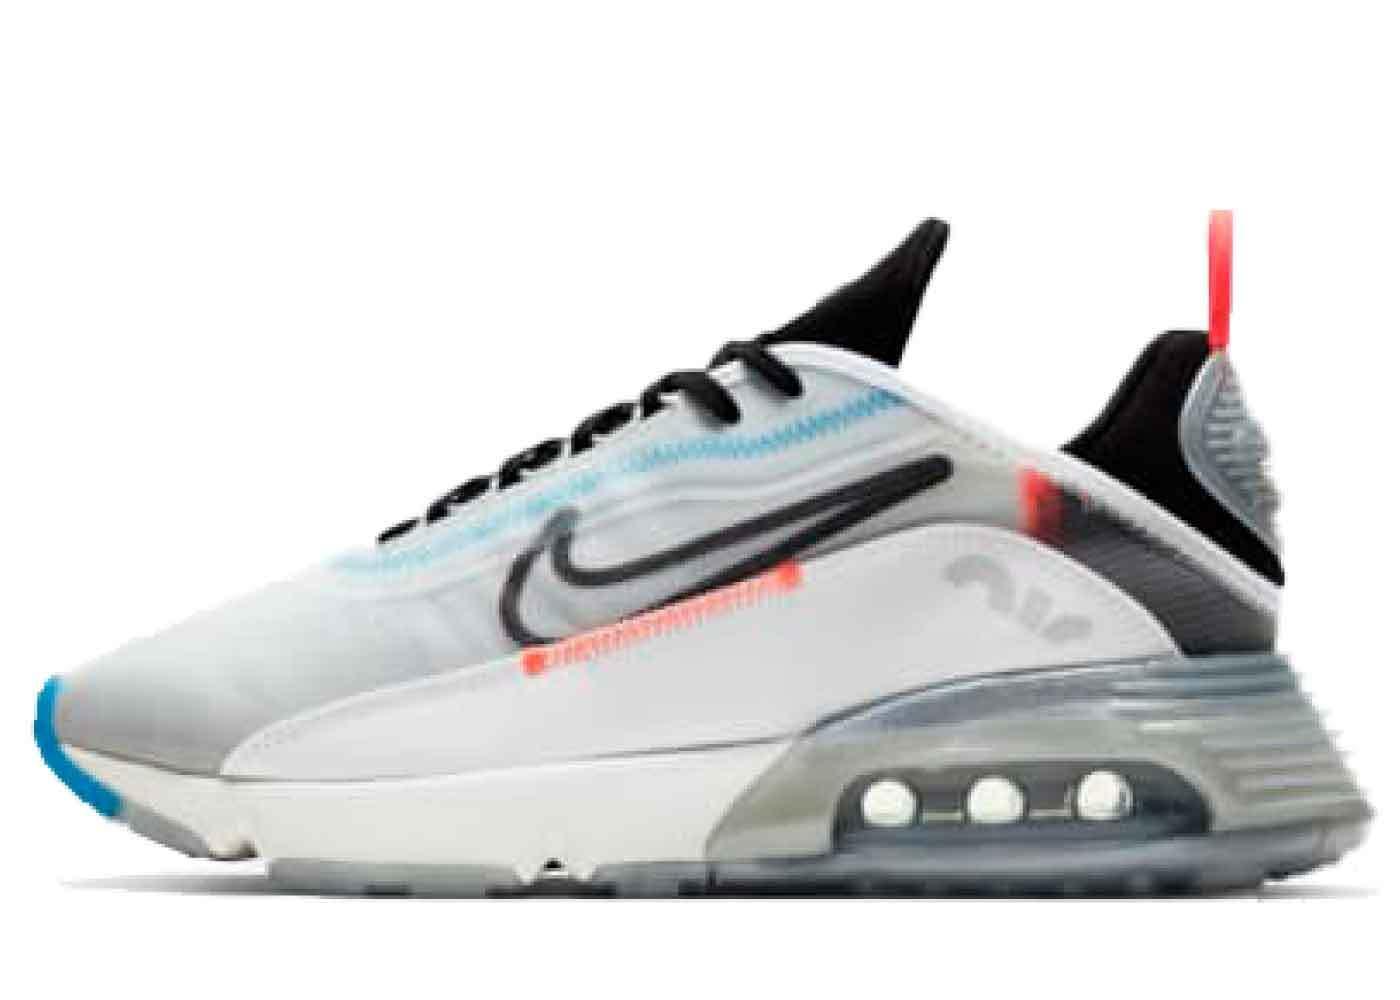 Nike Air Max 2090 Pure Platinumの写真